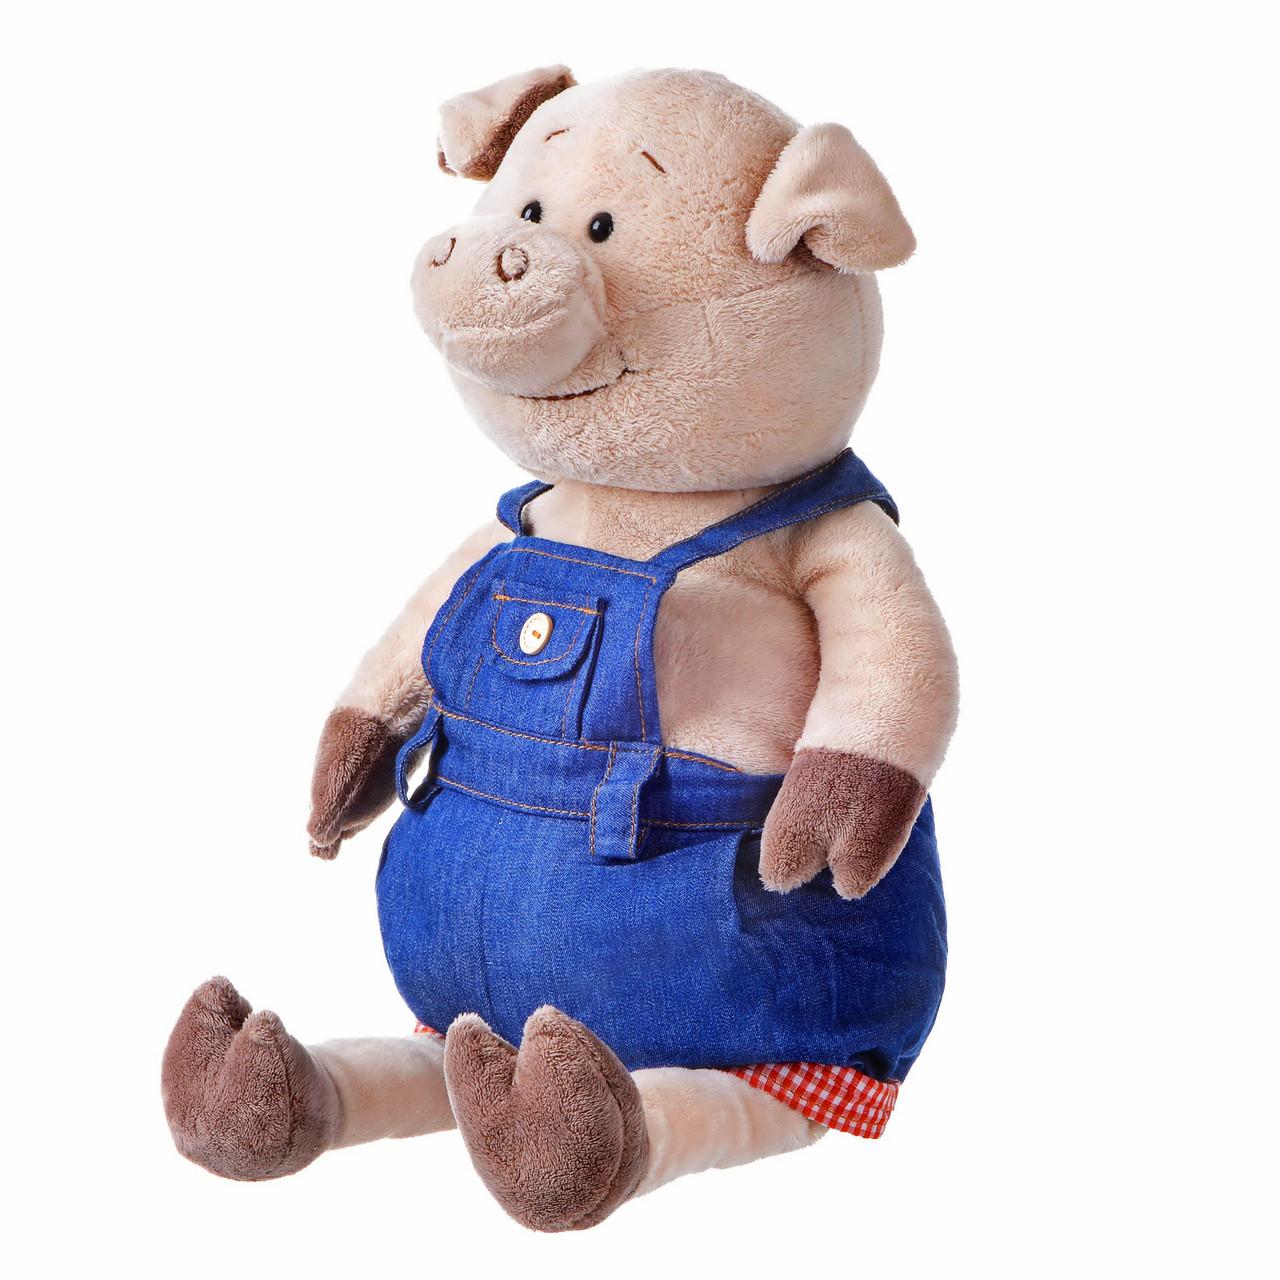 Свинка в джинсовом комбинезоне, 45 см, «Same Toy» (THT711)